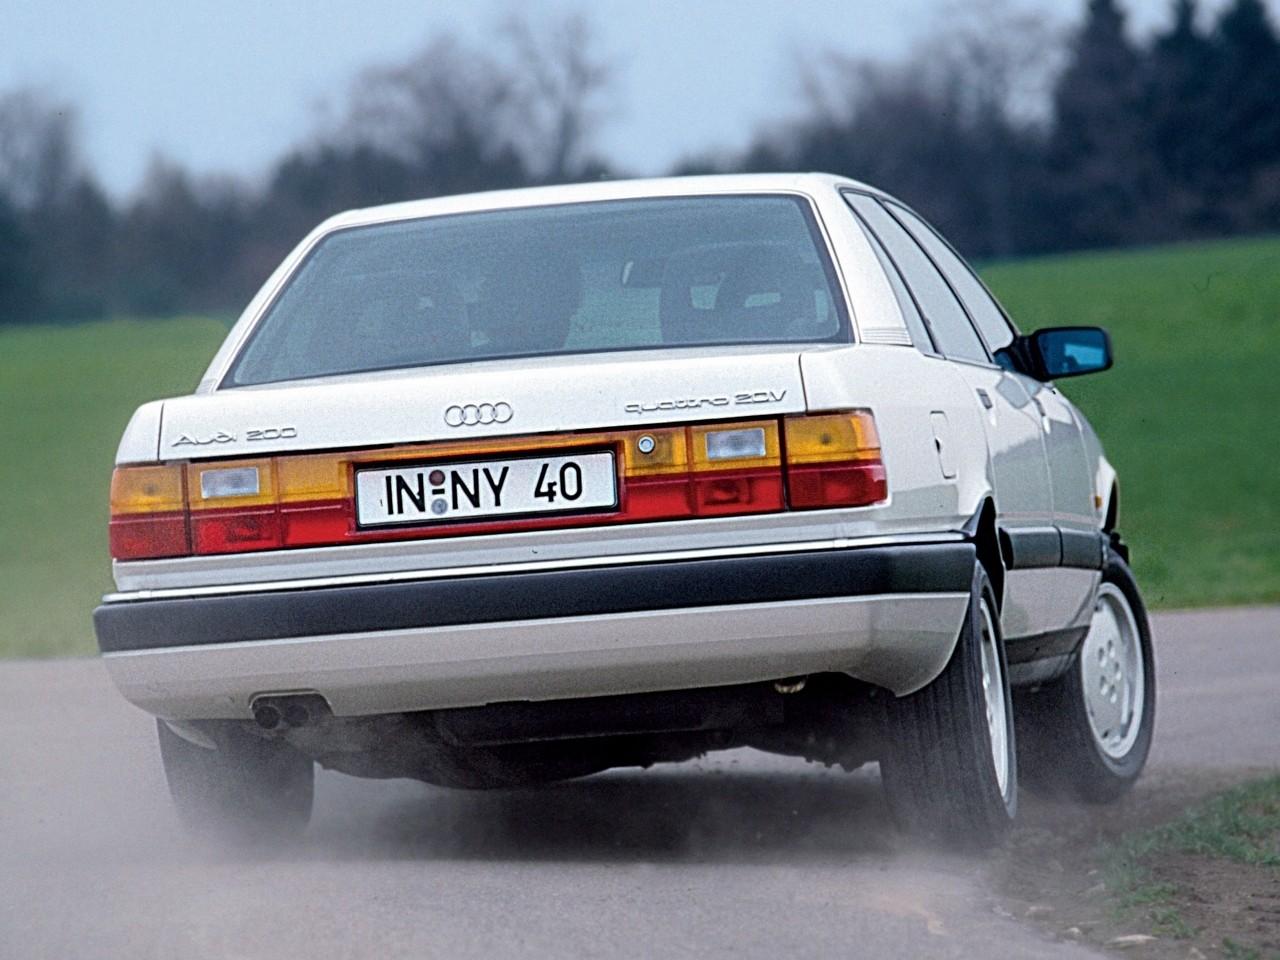 AUDI 200 - 1984, 1985, 1986, 1987, 1988, 1989, 1990, 1991 ...